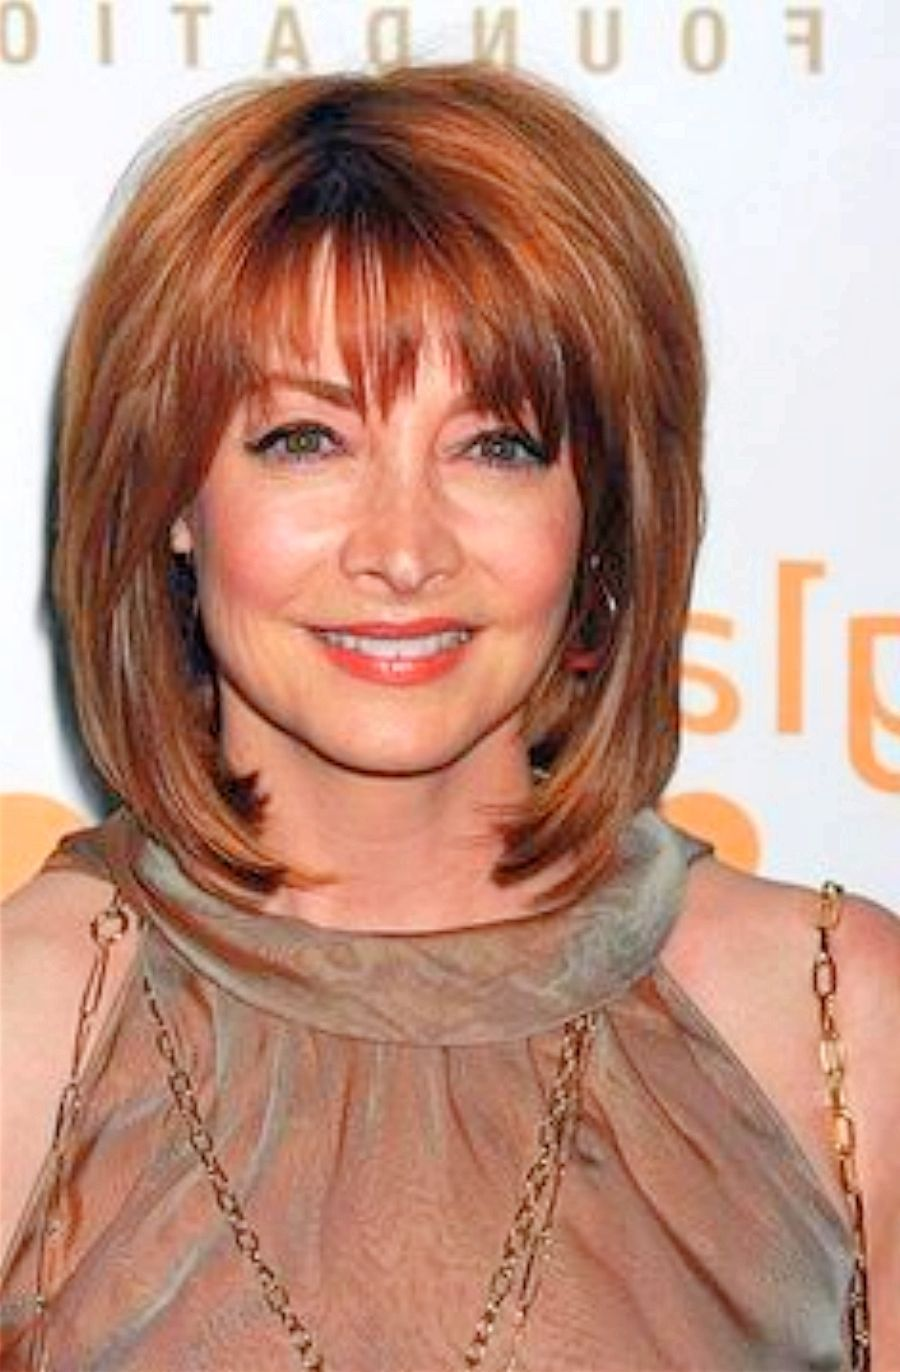 Medium bob hairstyles for women over 50 - Medium Length Hairstyles For Women Over 60